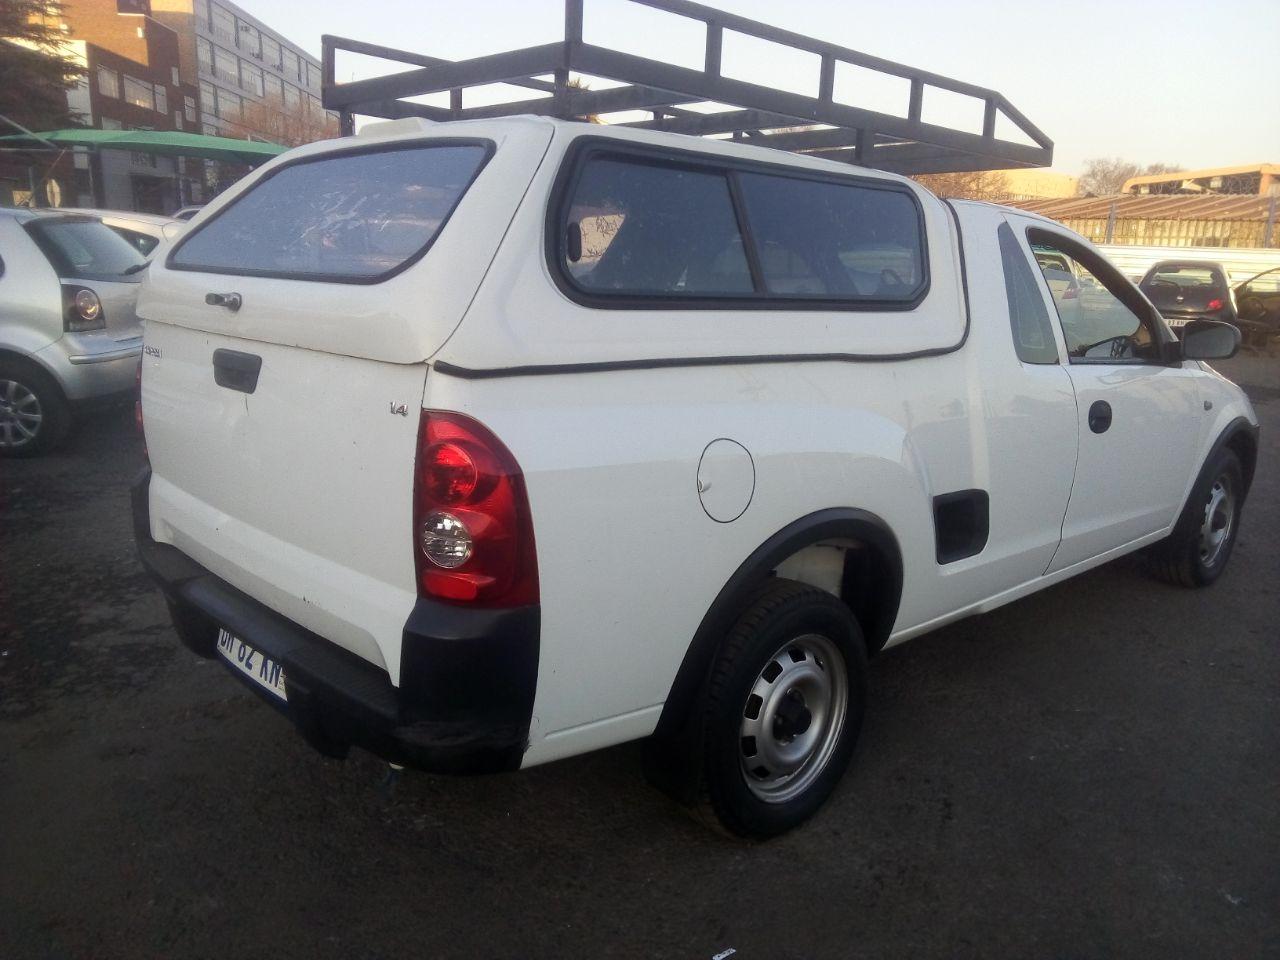 2011 Chevrolet Corsa Utility 1.4 Club